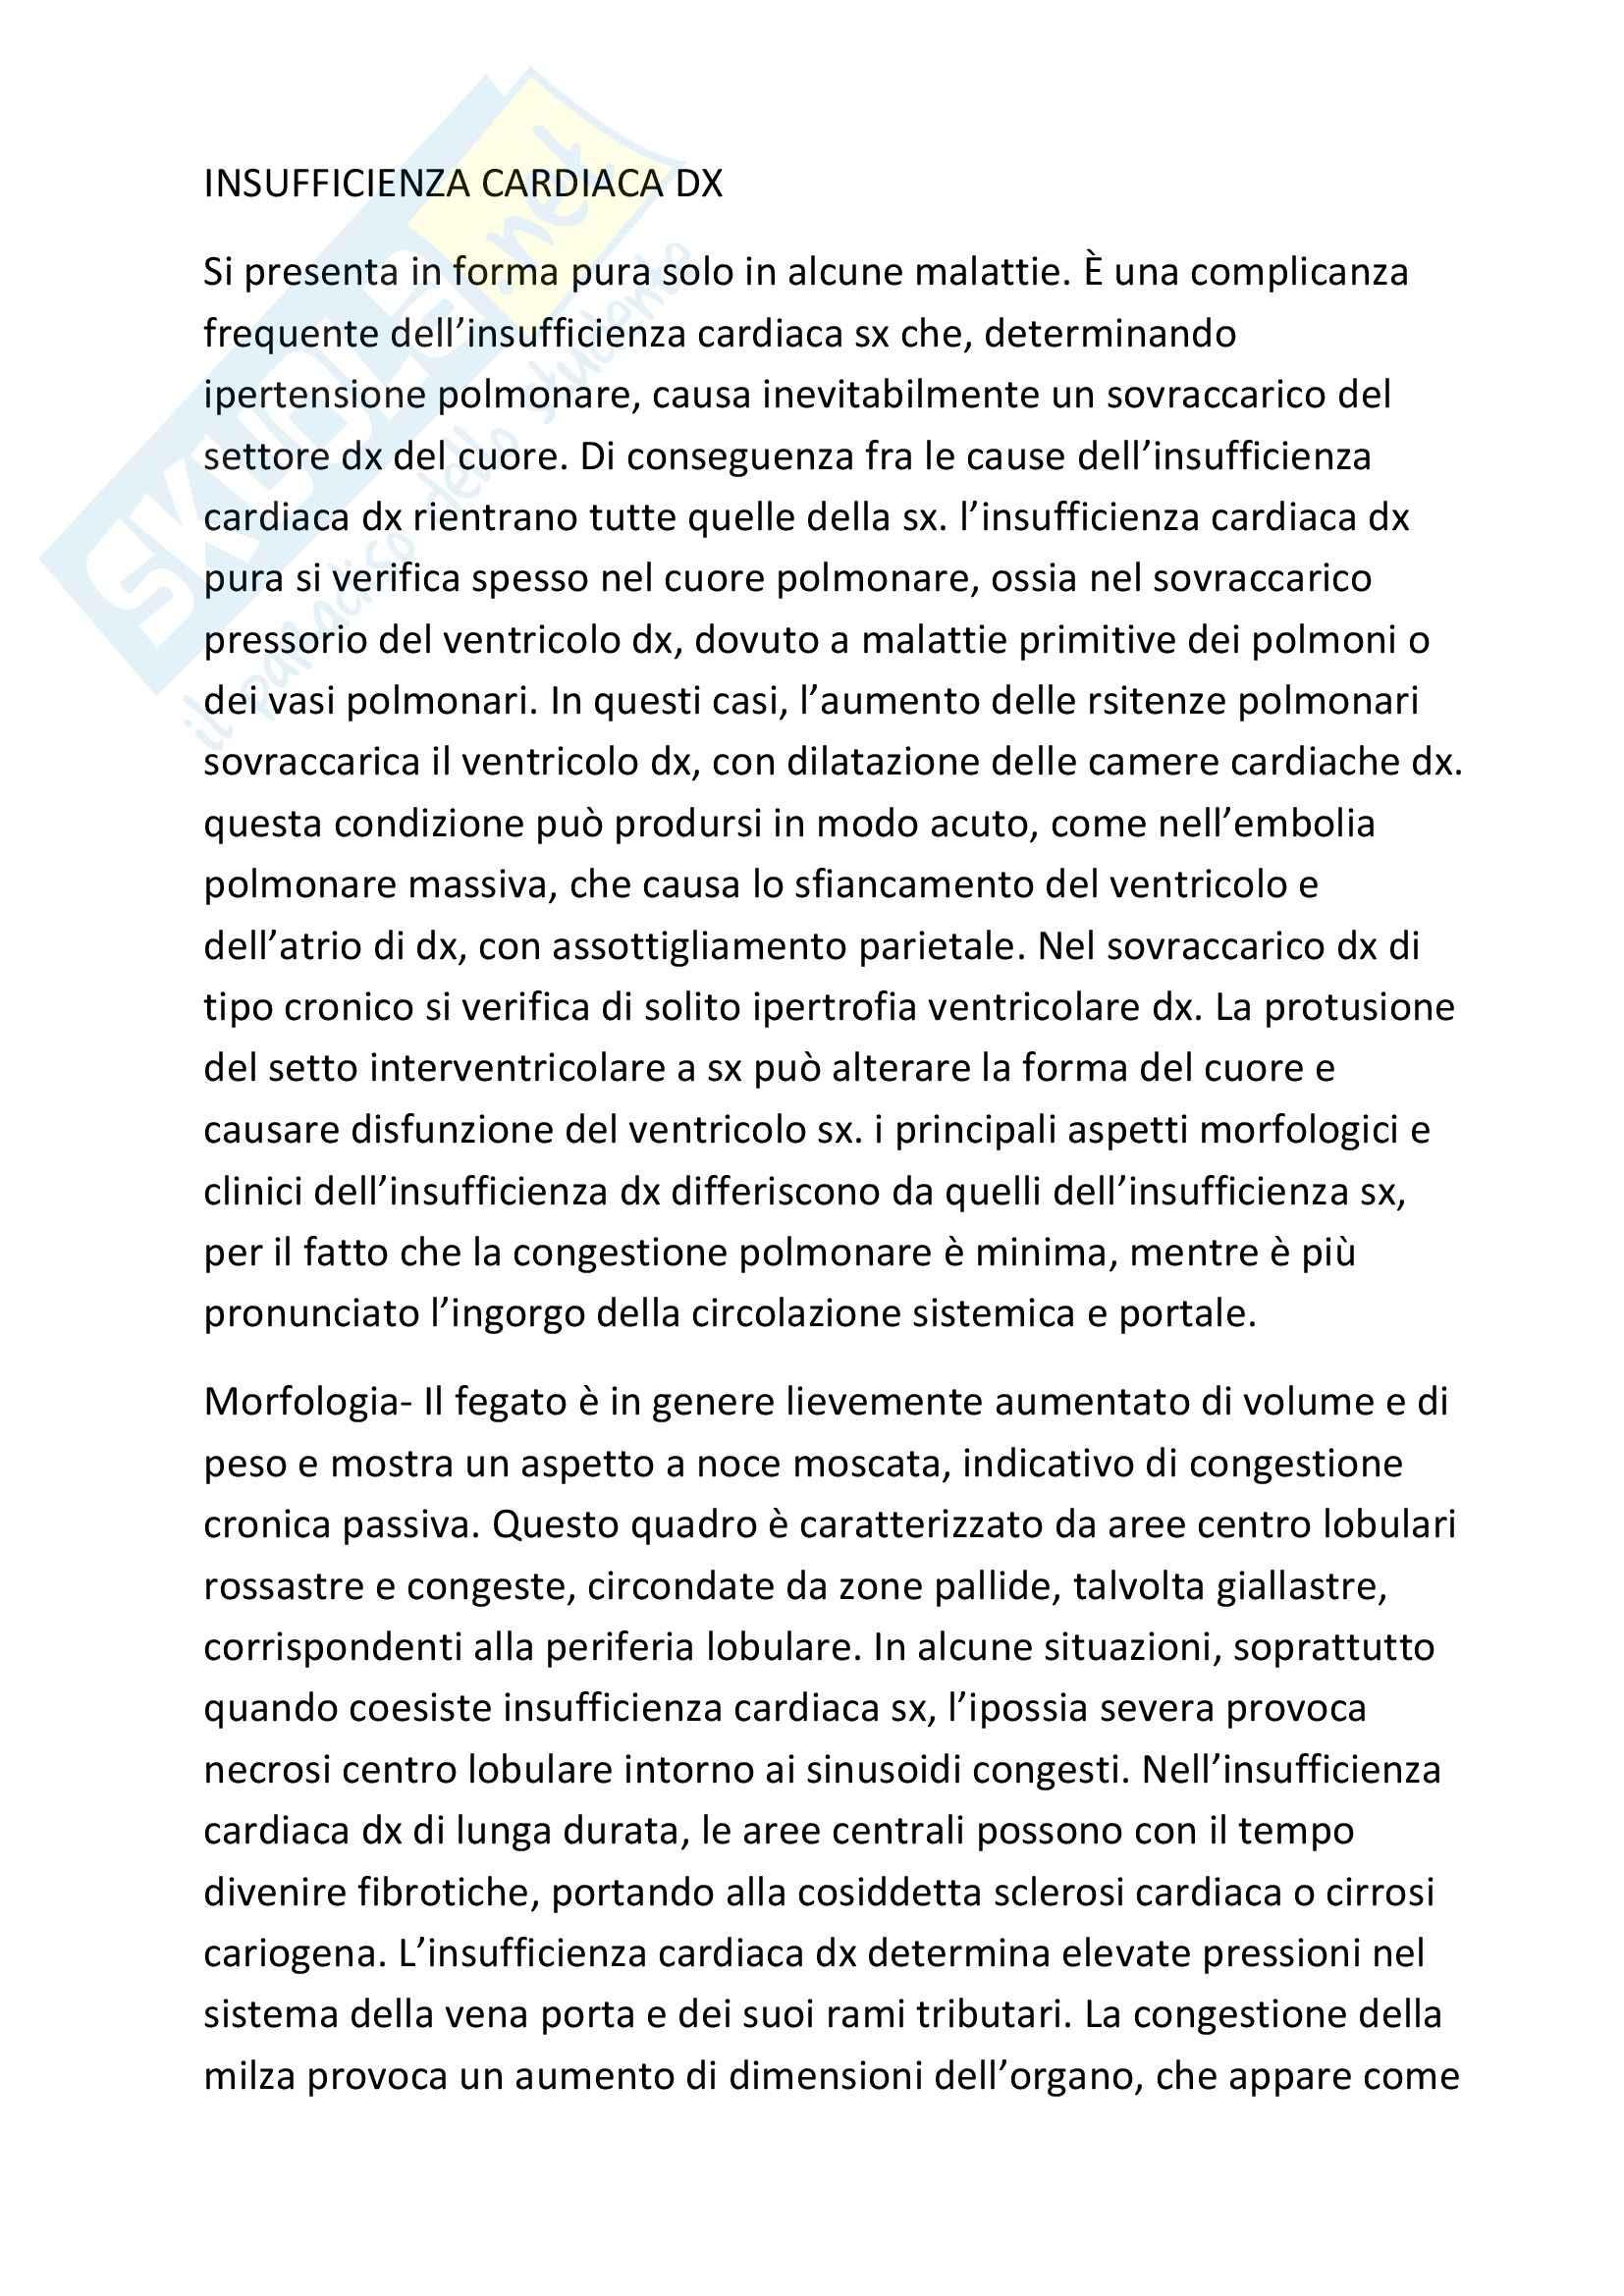 Anatomia patologica - Insufficienza cardiaca Dx e Sx